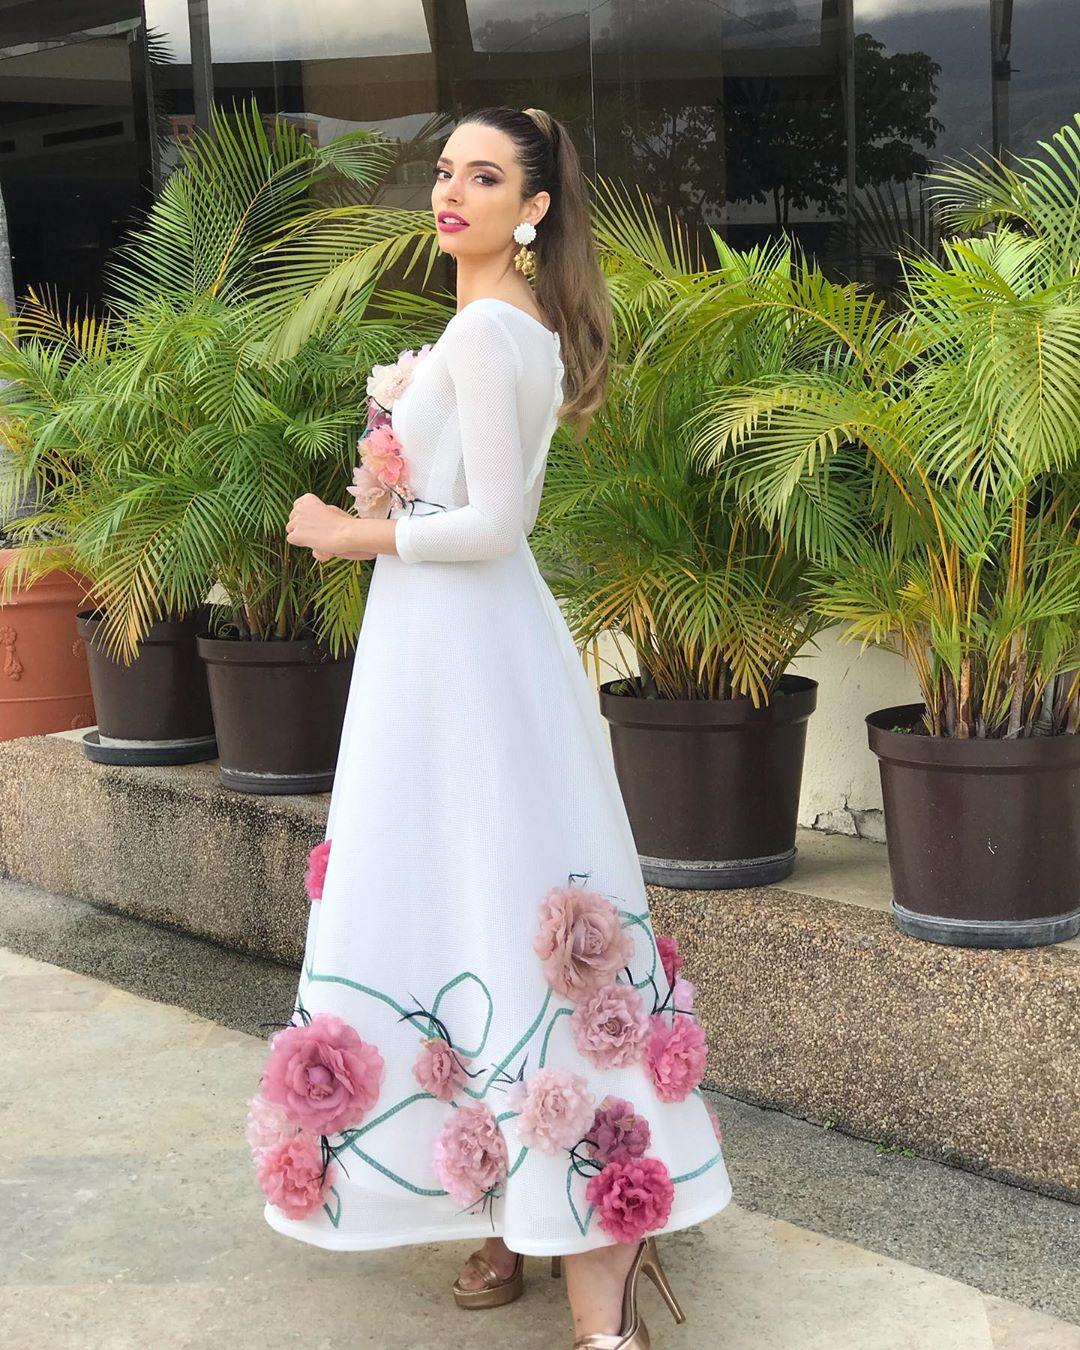 ainara de santamaria villamor, top 21 de miss grand international 2019/miss world cantabria 2018/miss earth spain 2017. - Página 17 75419810